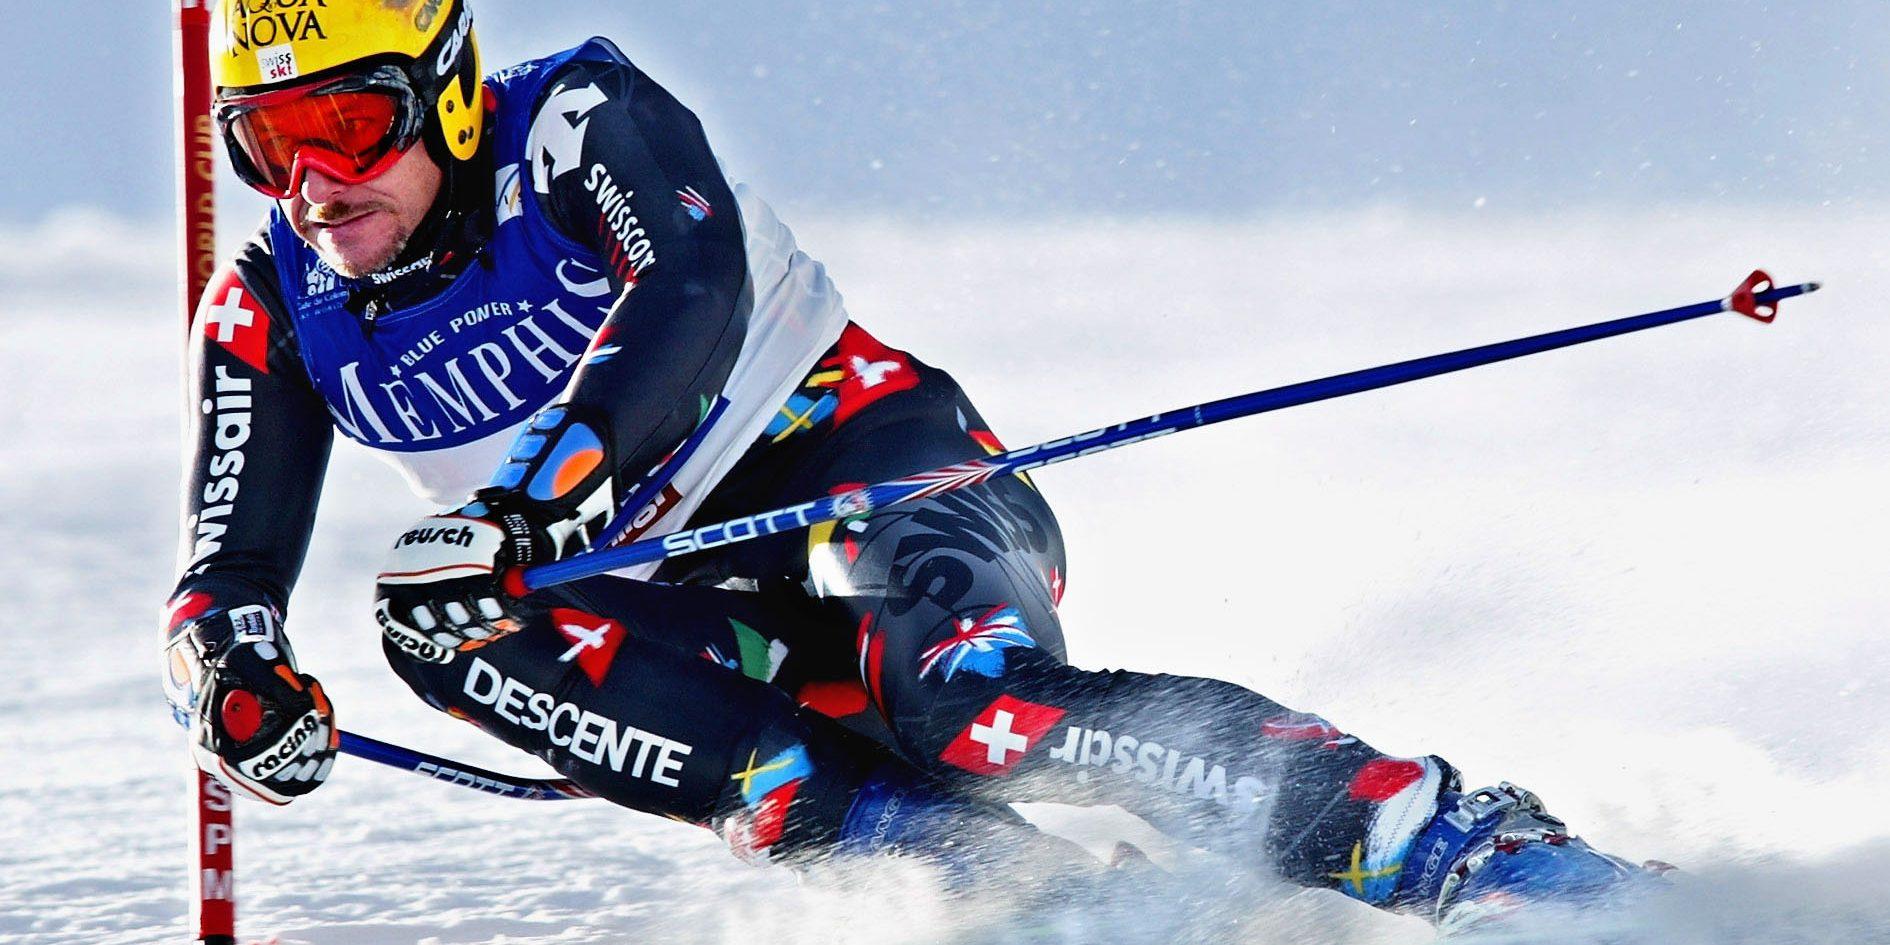 ×Copyright: GEPA pictures ×Photographer: Markus Ulmer ×Name: GrŸnigen ×Rubric: Sport ×Type: Ski alpin ×Event: Weltcup, Riesentorlauf Herren ×Site: Sšlden, …sterreich ×Date: 27/10/01 ×Description: Michael von GrŸnigen (SUI) ×Archive: DCSPZ-281001506 ×RegDate: 28.10.2001 ×Note: 4,5 Mb - CB/CB